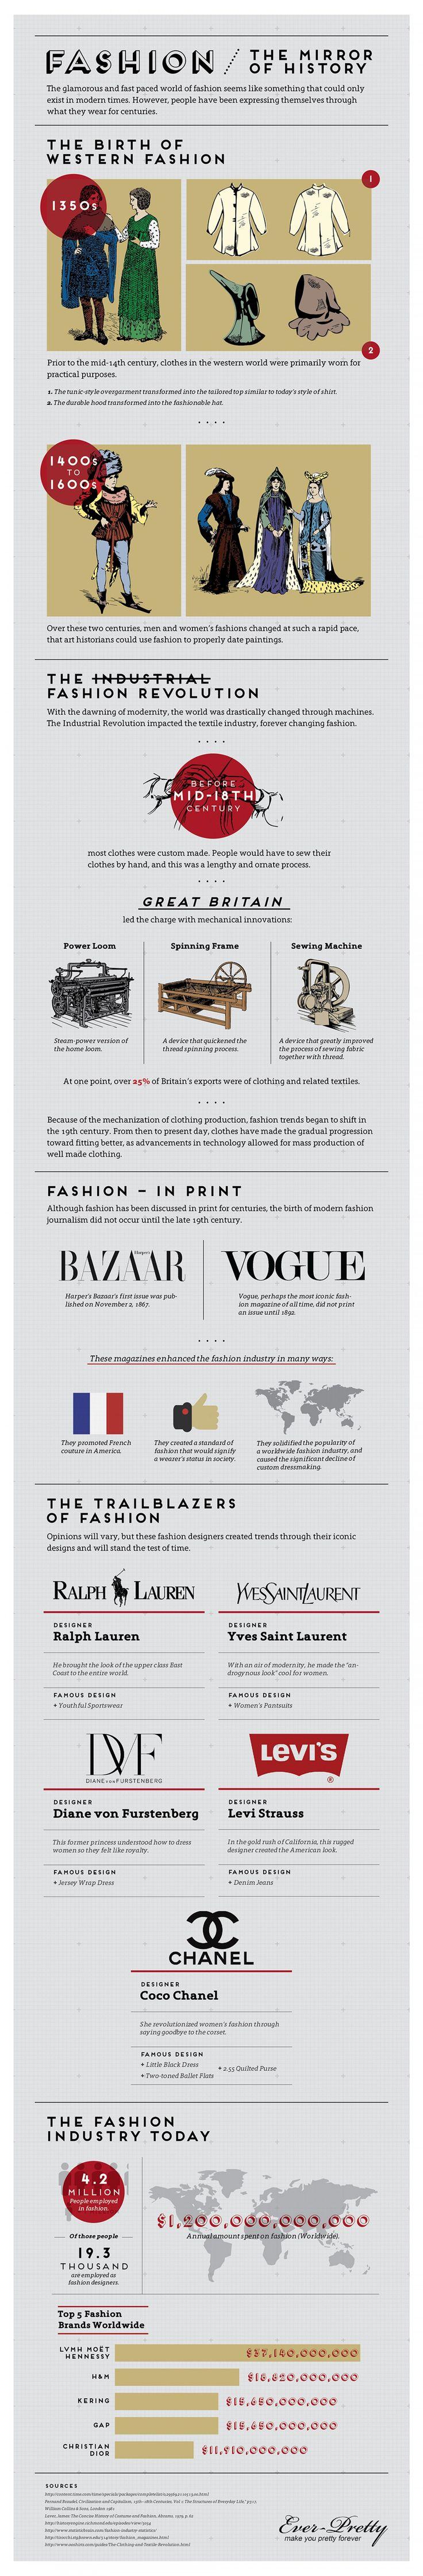 Fashion - The Mirror of History #infografía